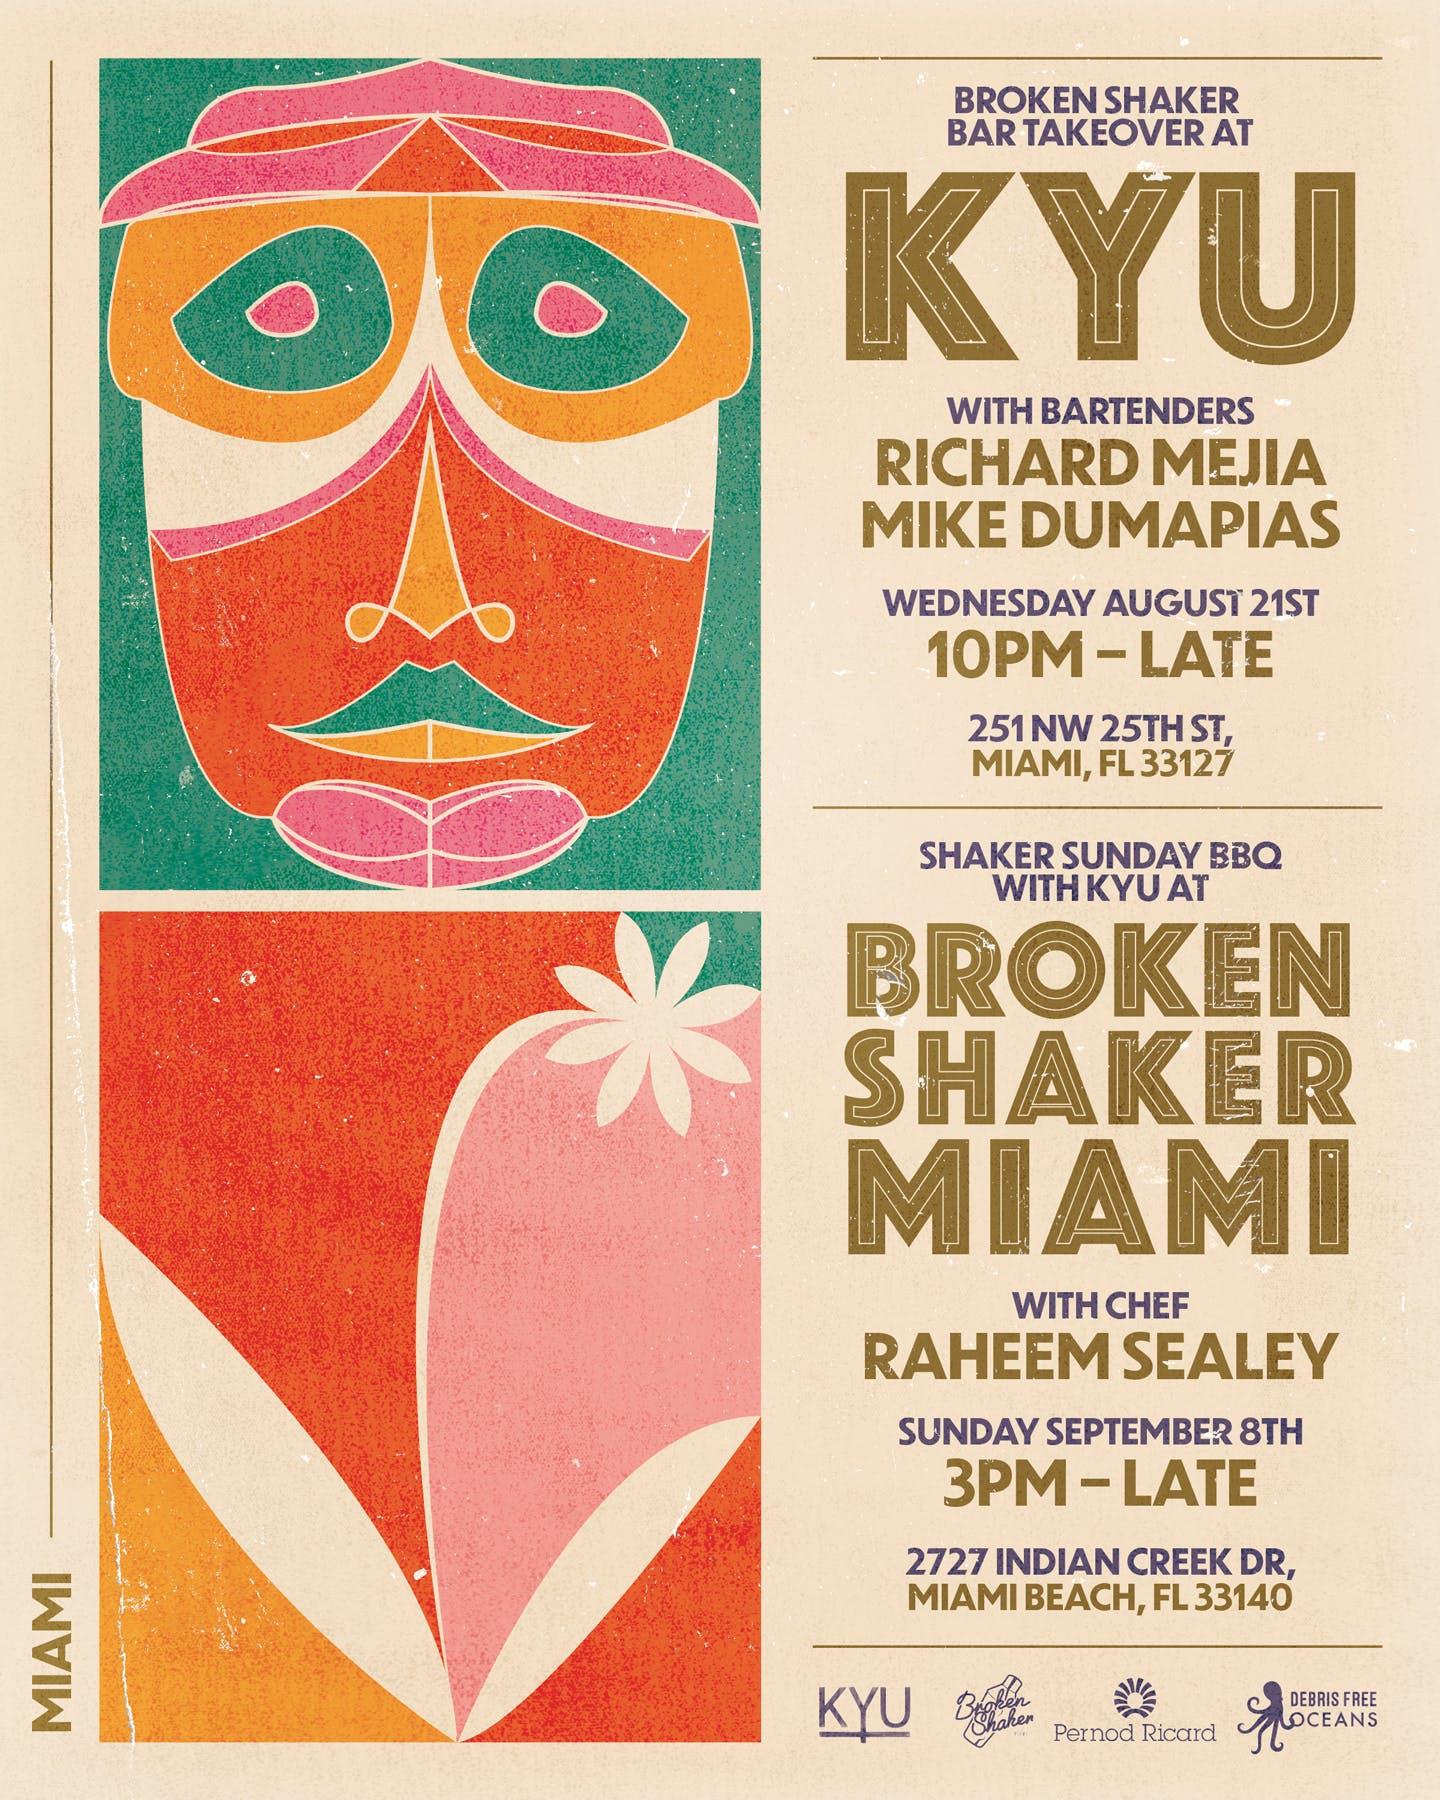 Broken Shaker and KYU flyer